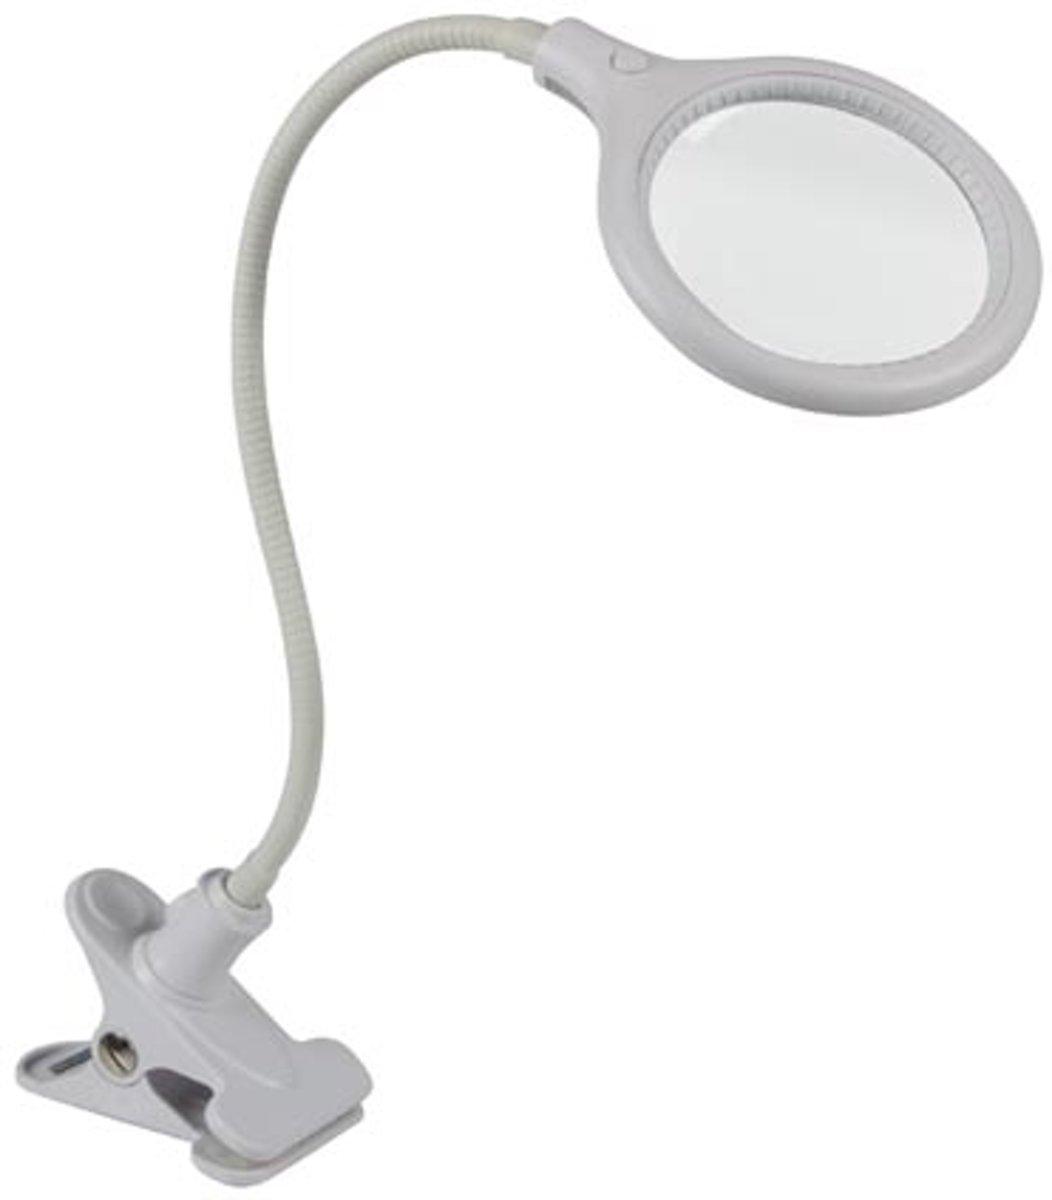 Led-Bureaulamp Met Bevestigingsklem - Loep (5 Dioptrie) - 4W - 32 Leds - Wit kopen